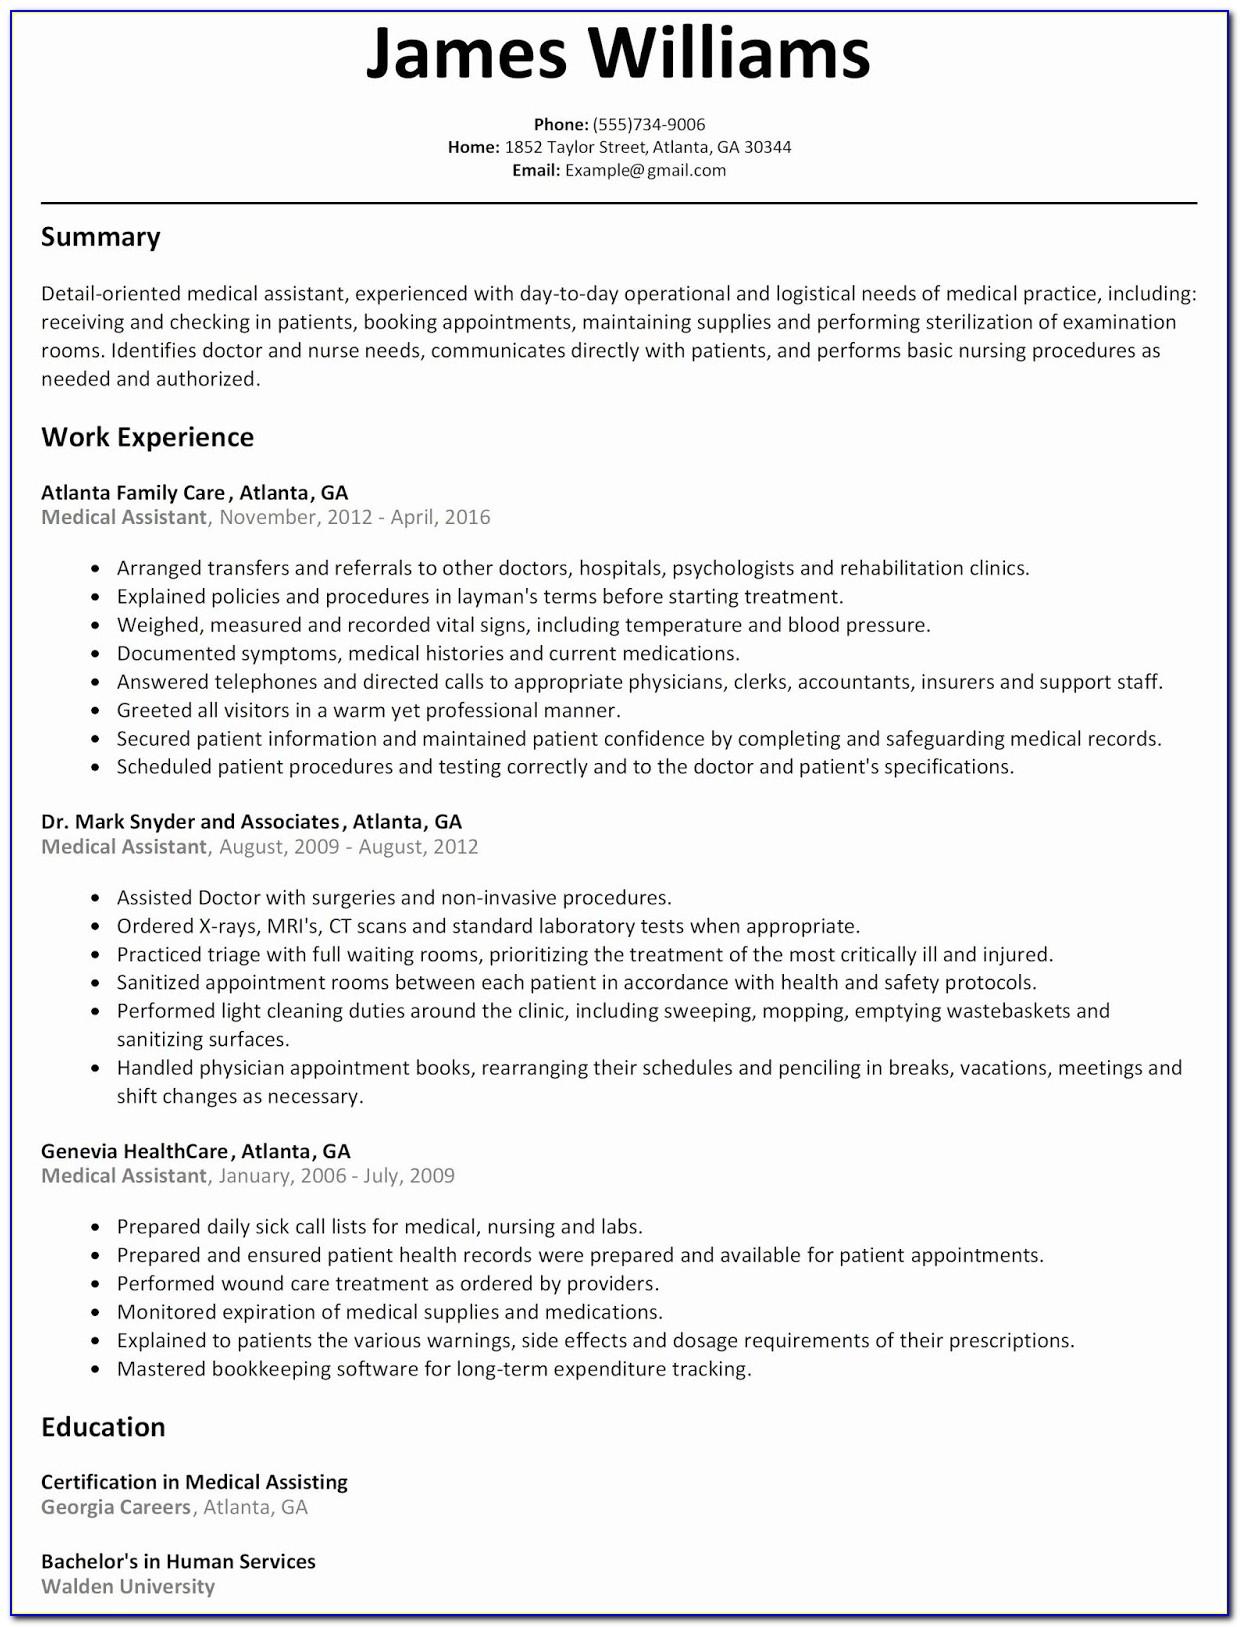 Download Resume Templates Microsoft Word 2010